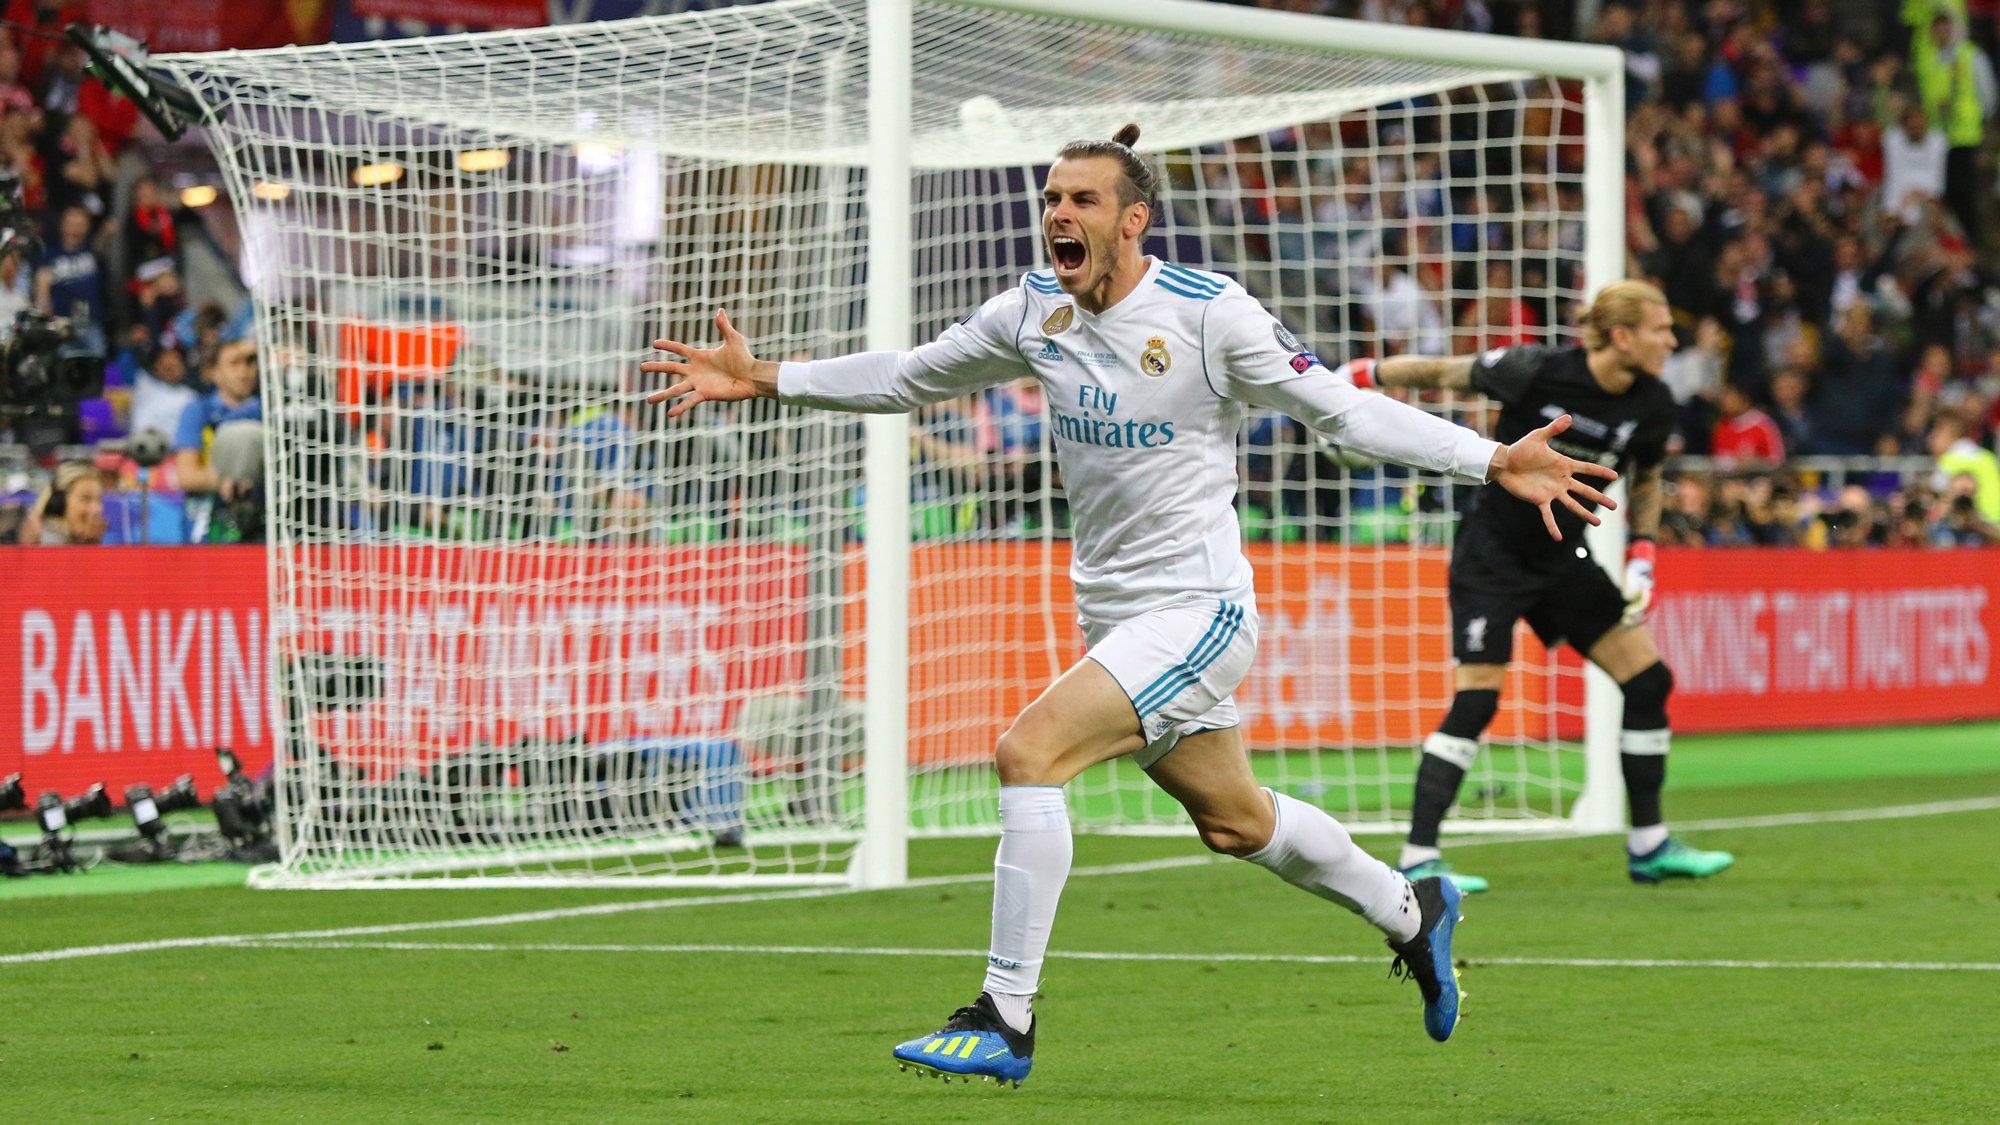 Real Madrid vs. Atletico Madrid - Football Match Summary ...